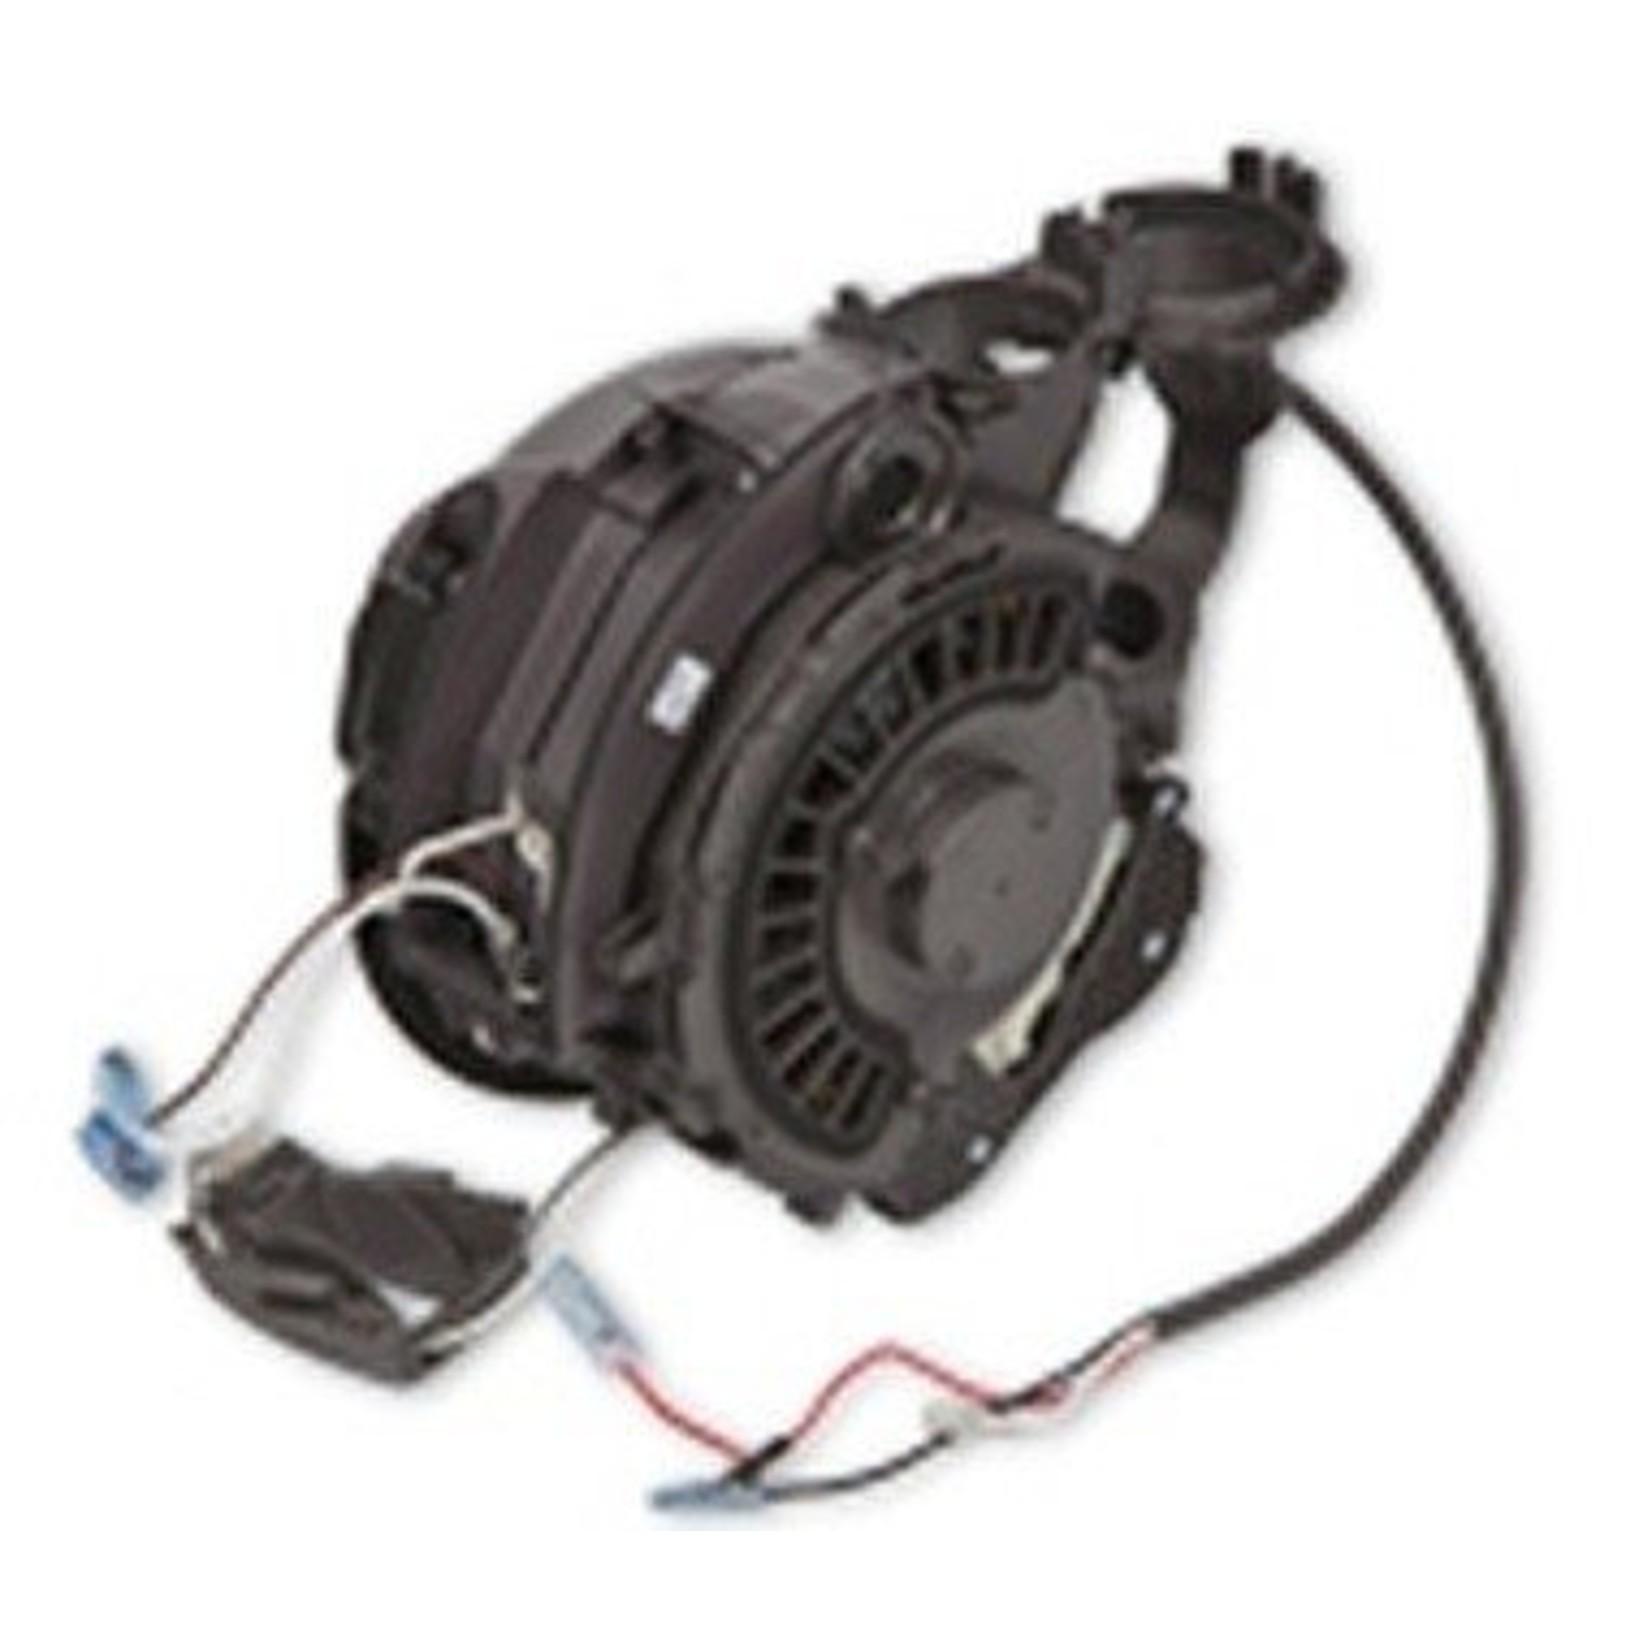 Dyson Dyson DC41 / UP13 / DC65 Main Motor Bucket Assy.